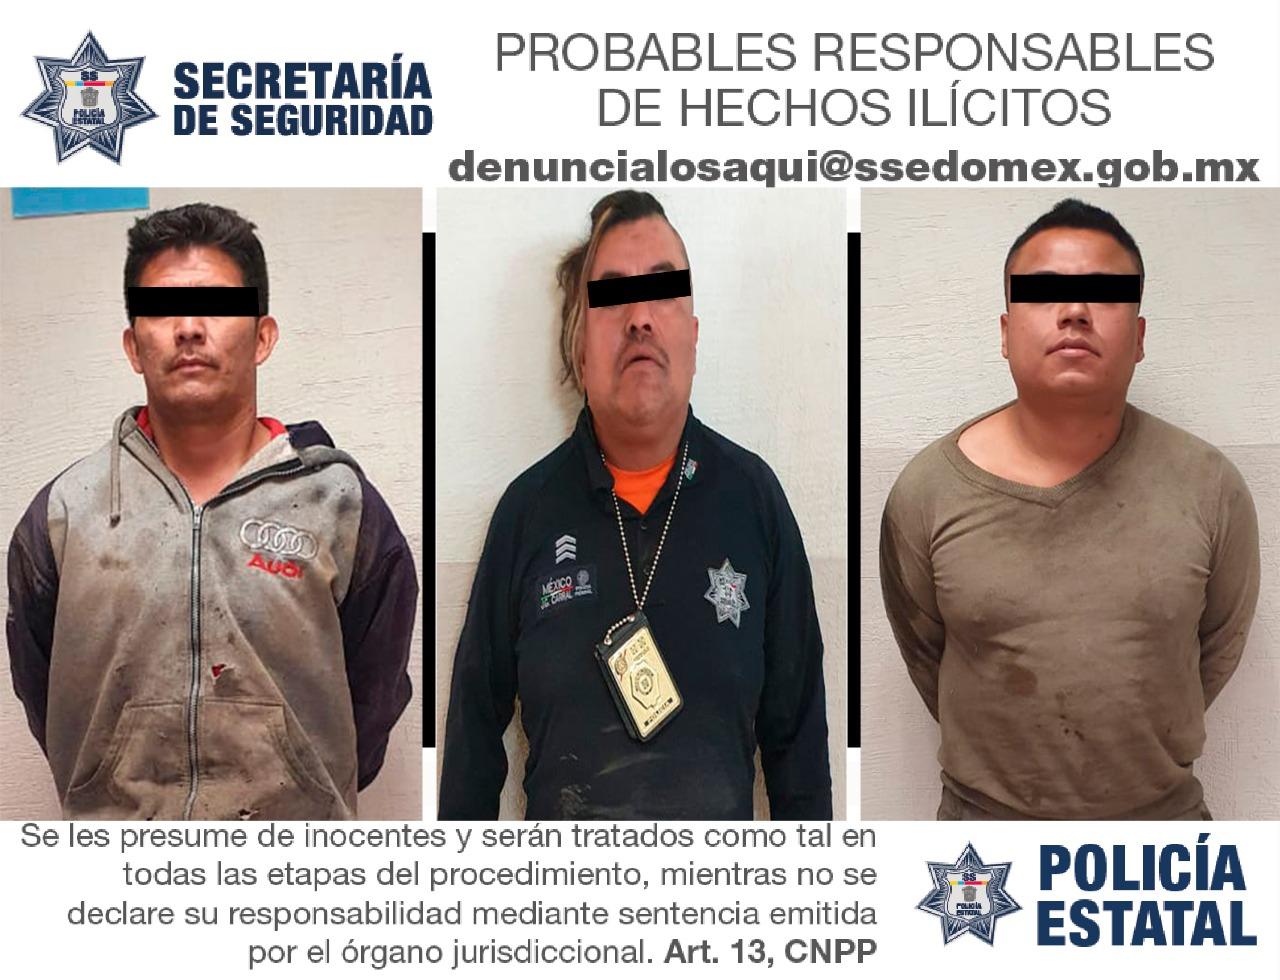 APREHENDEN A TRES SUJETOS PROBABLES RESPONSABLES DEL DELITO DE ROBO EQUIPARADO